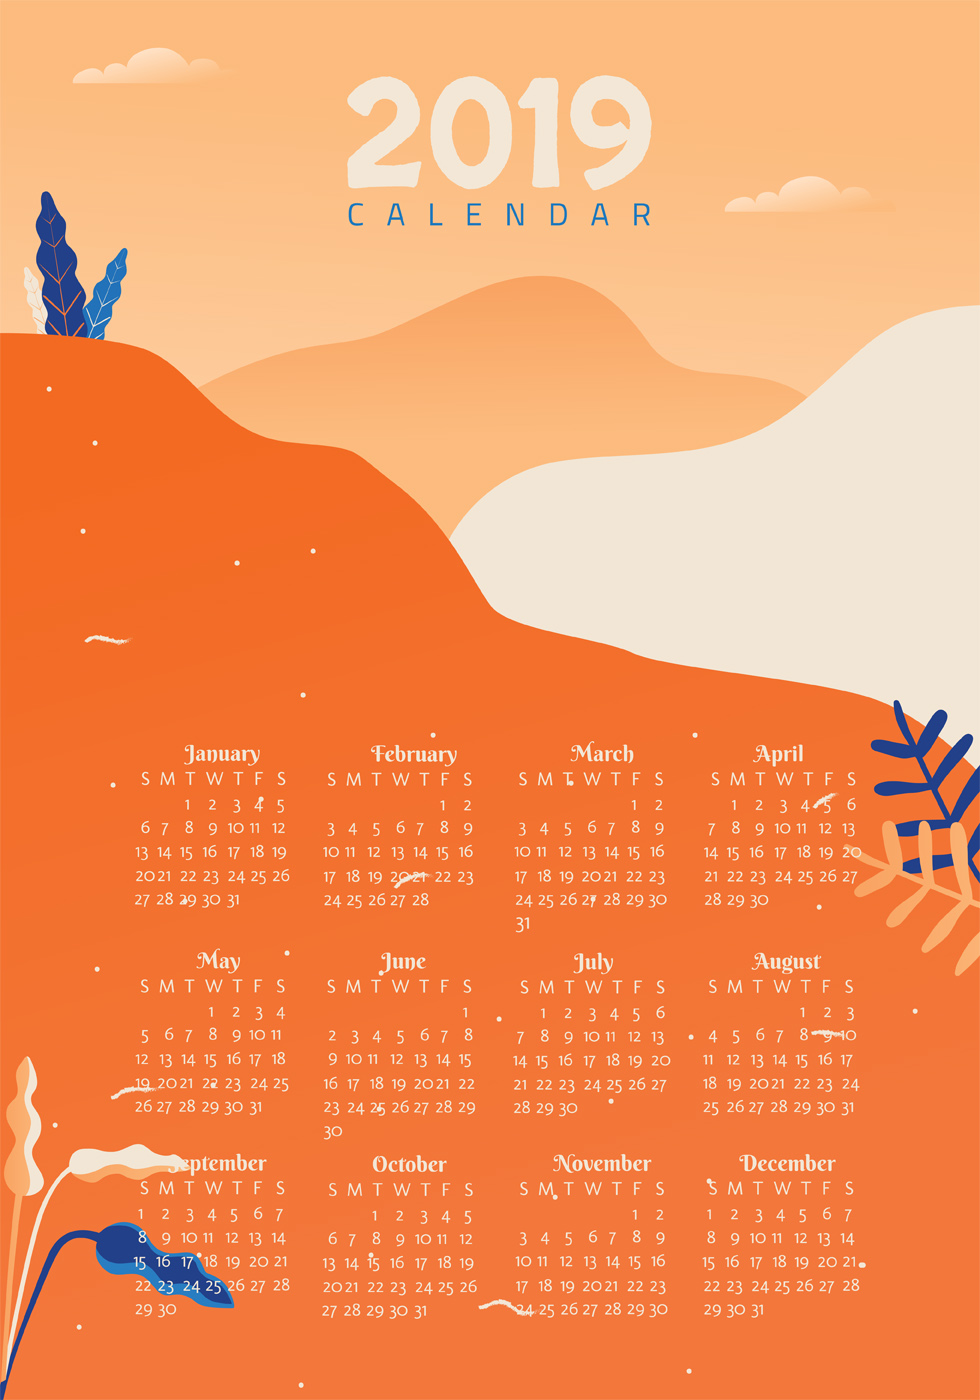 2019 Printable Calendar Vector Design - Download Free ...